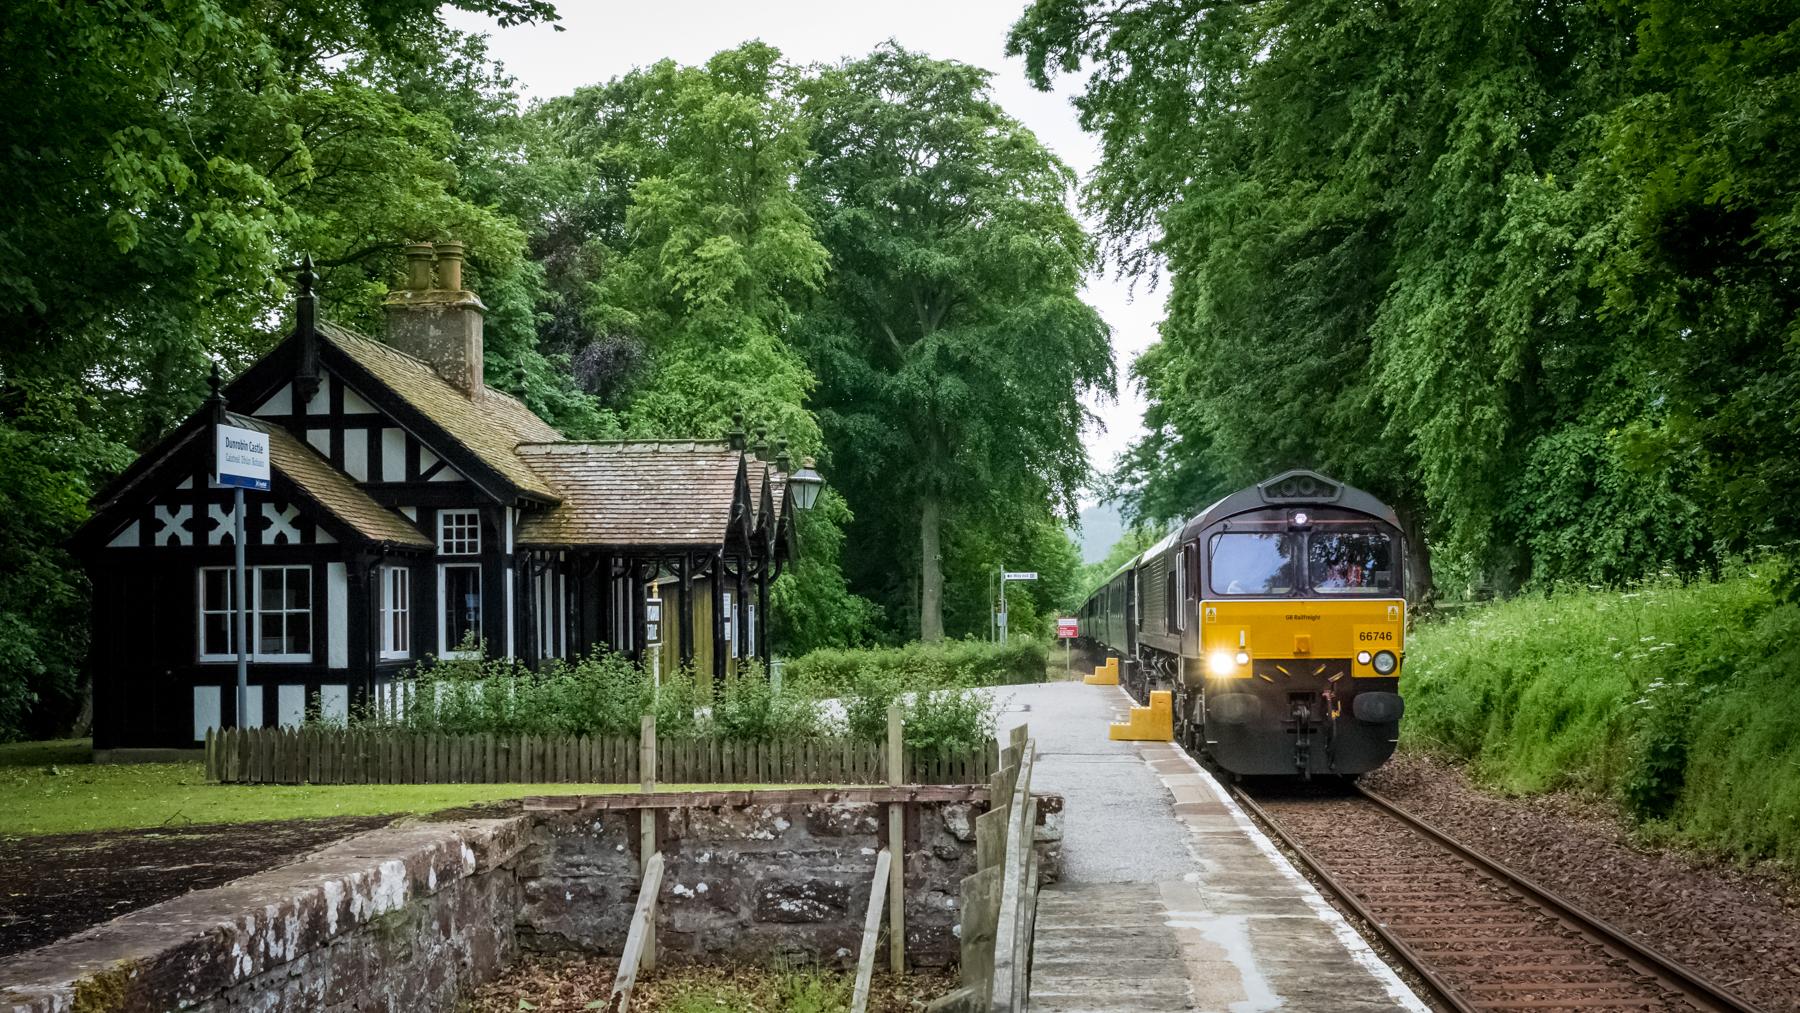 Royal_Scotsman_passing_Dunrobin_Castle_Station_(geograph_5442482).jpg